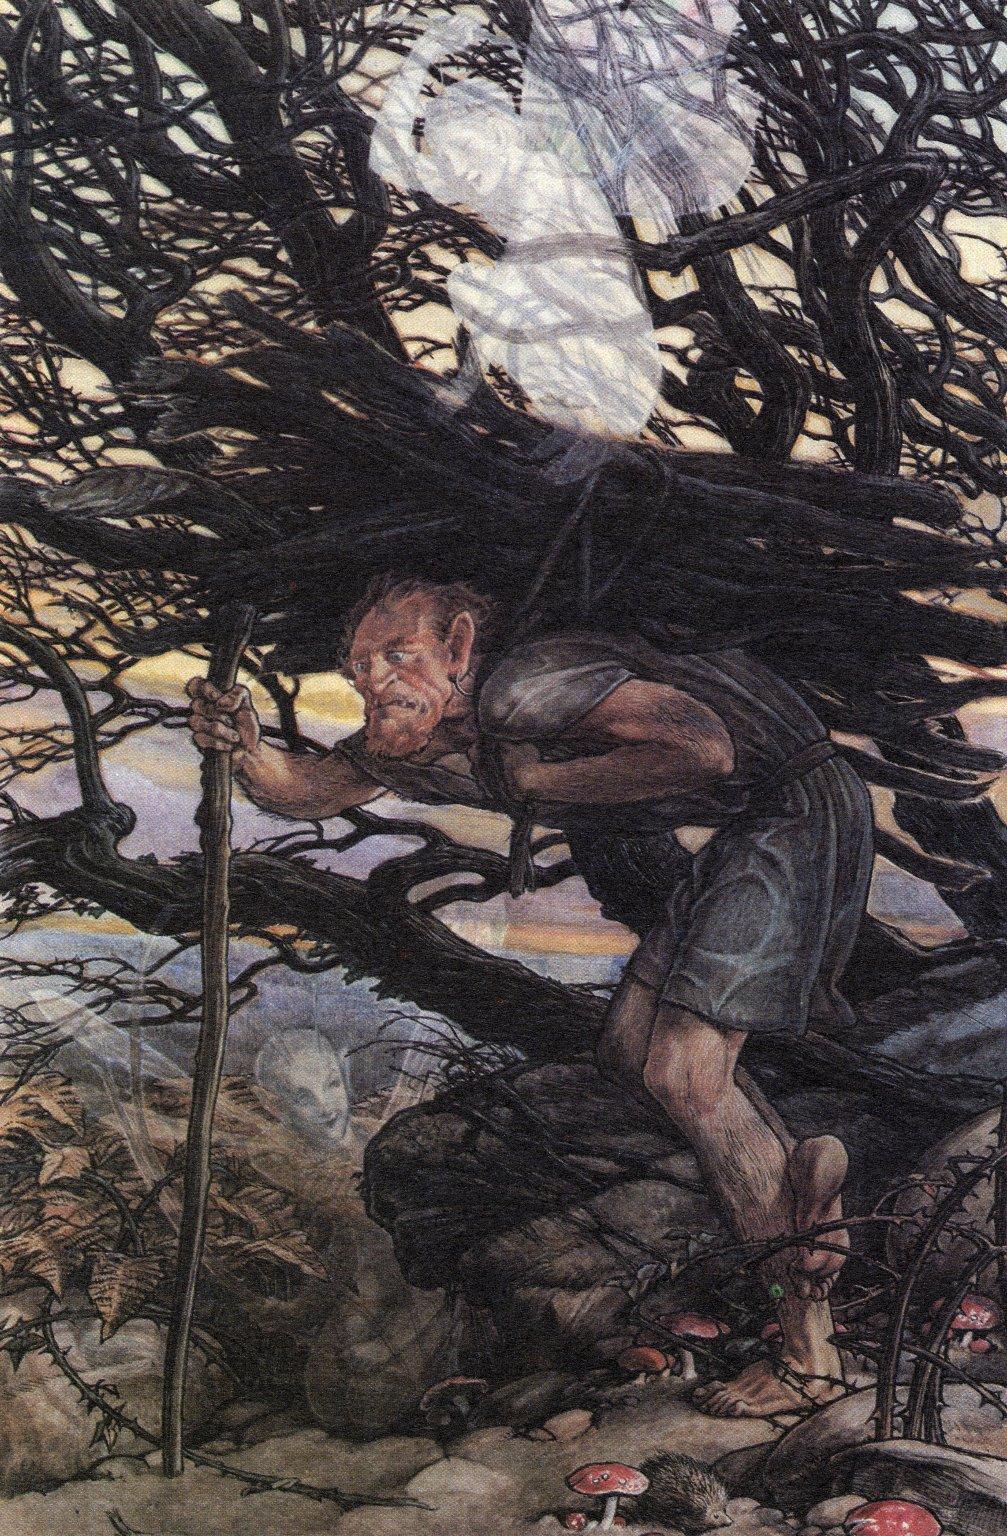 The tempest, Caliban, II, 2 [graphic] / Paul Woodroffe.